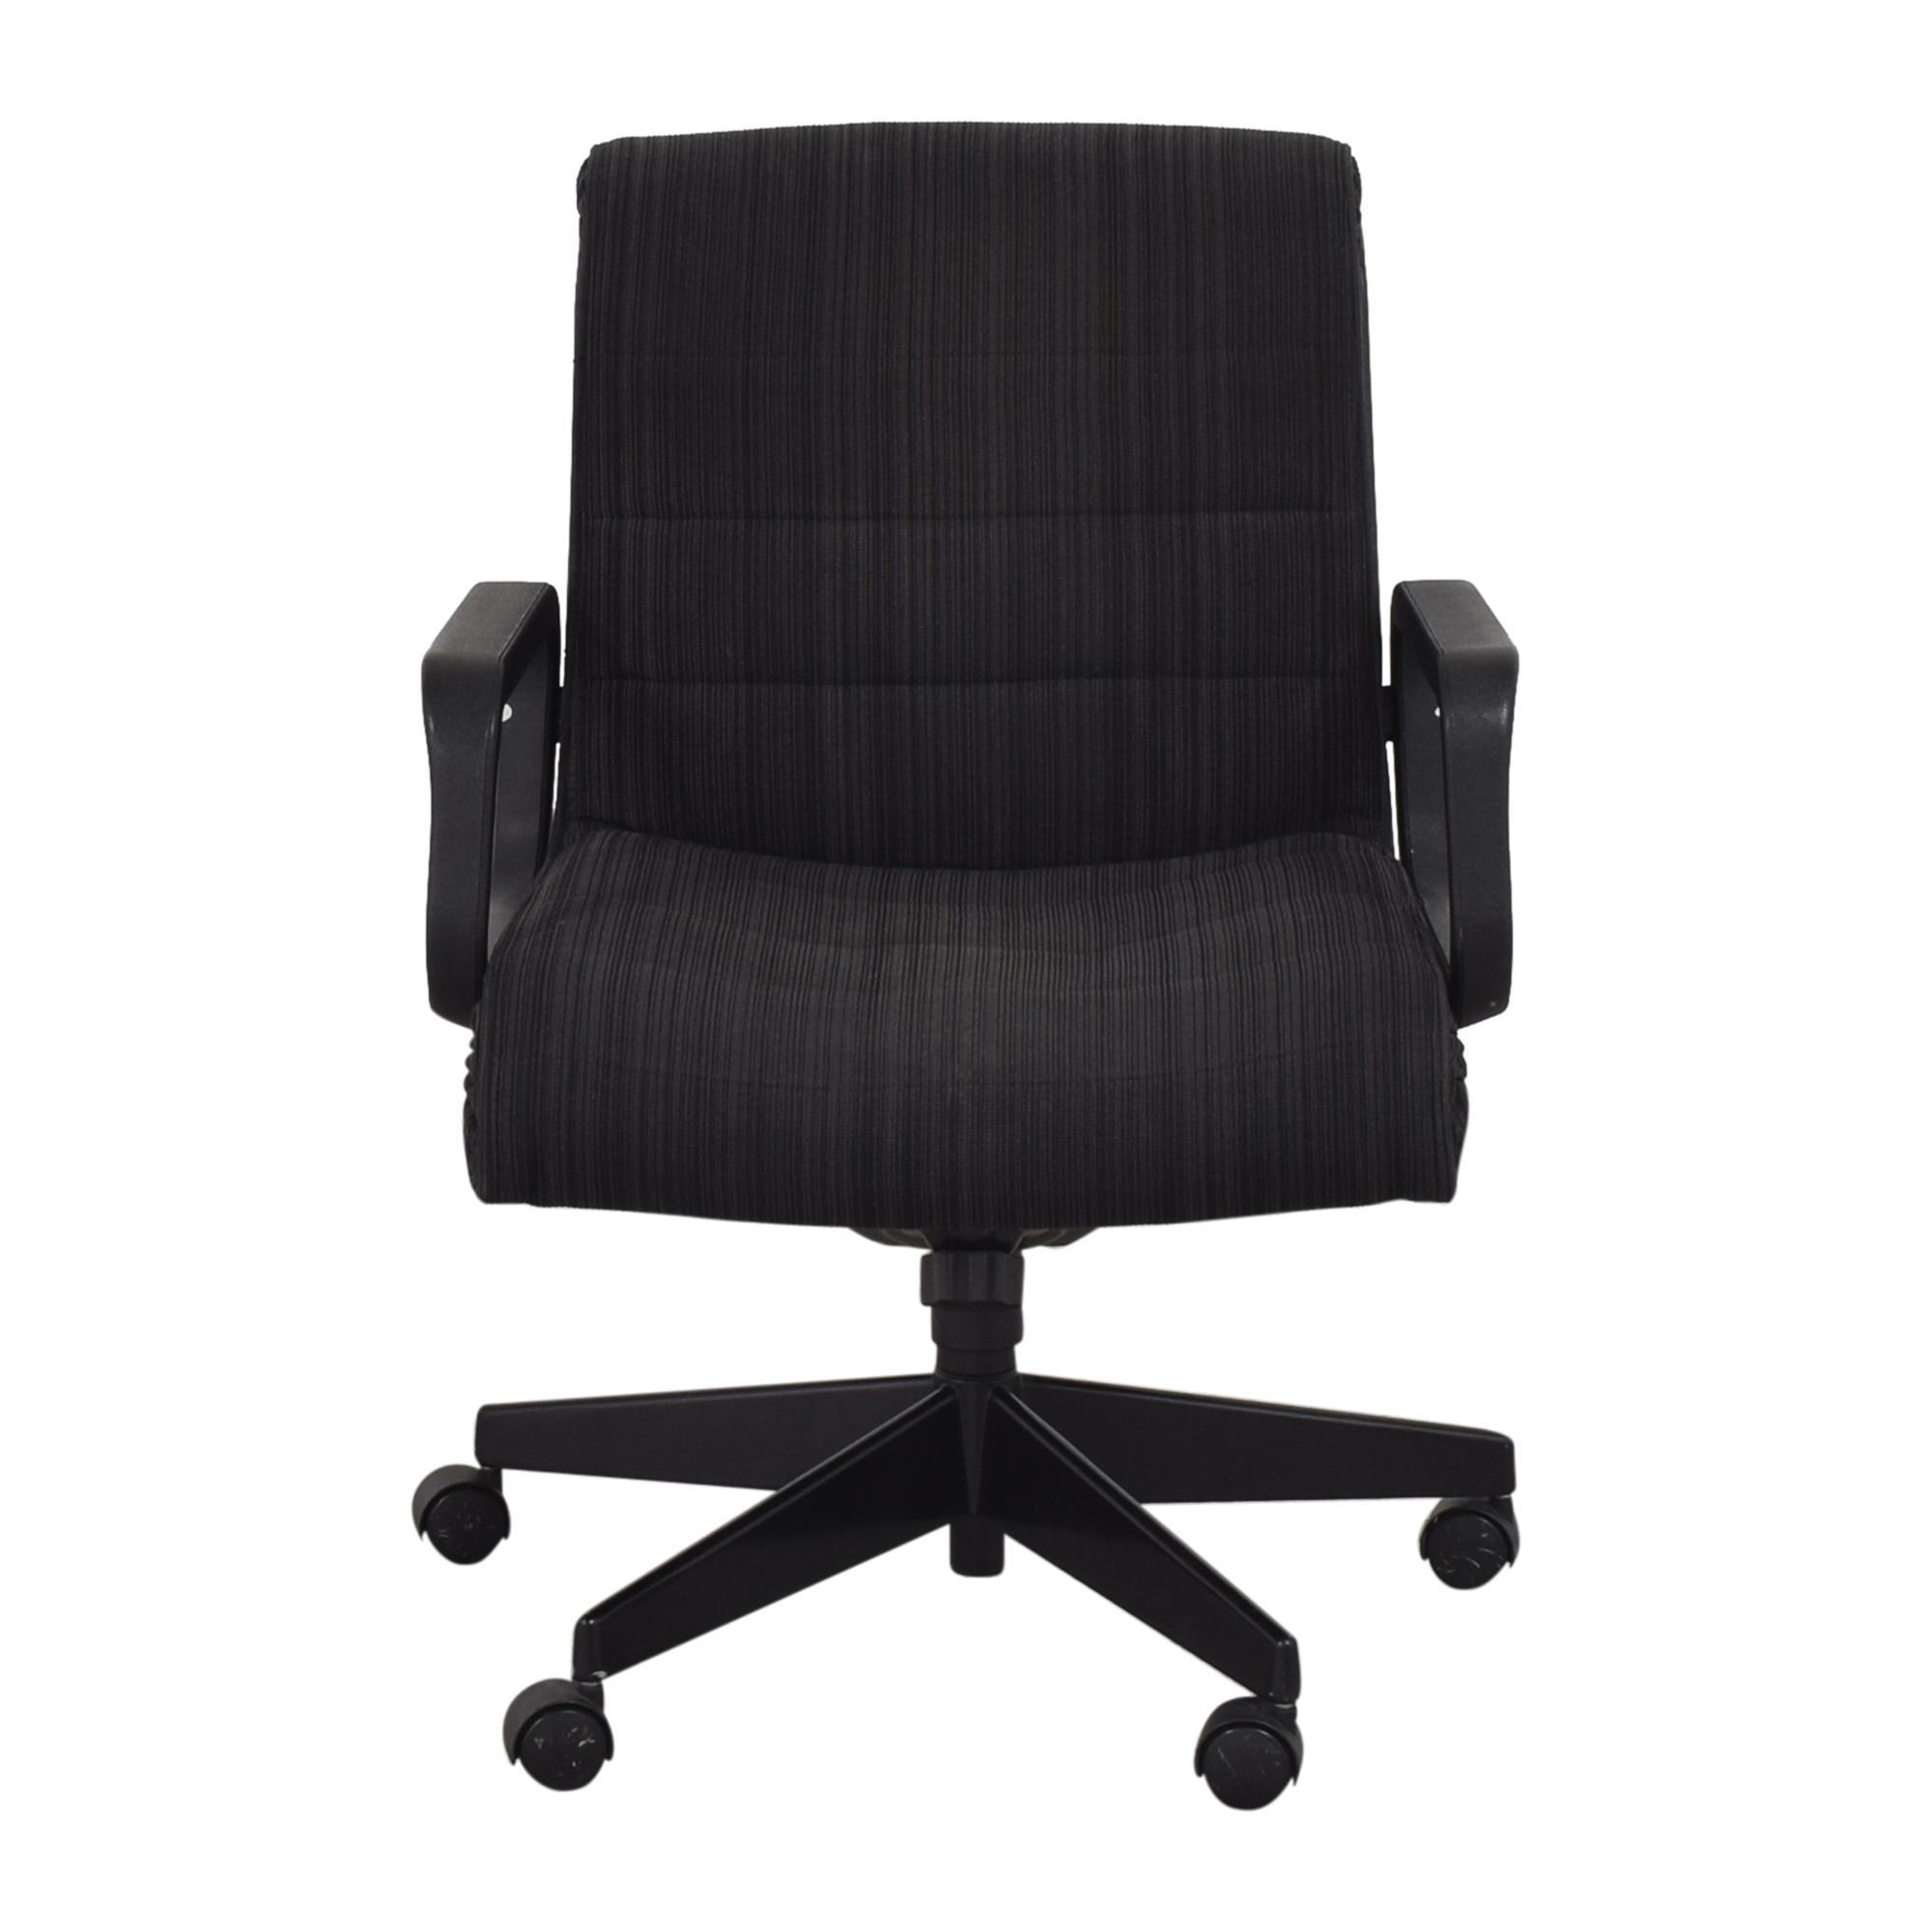 buy Knoll Richard Sapper Desk Chair Knoll Home Office Chairs